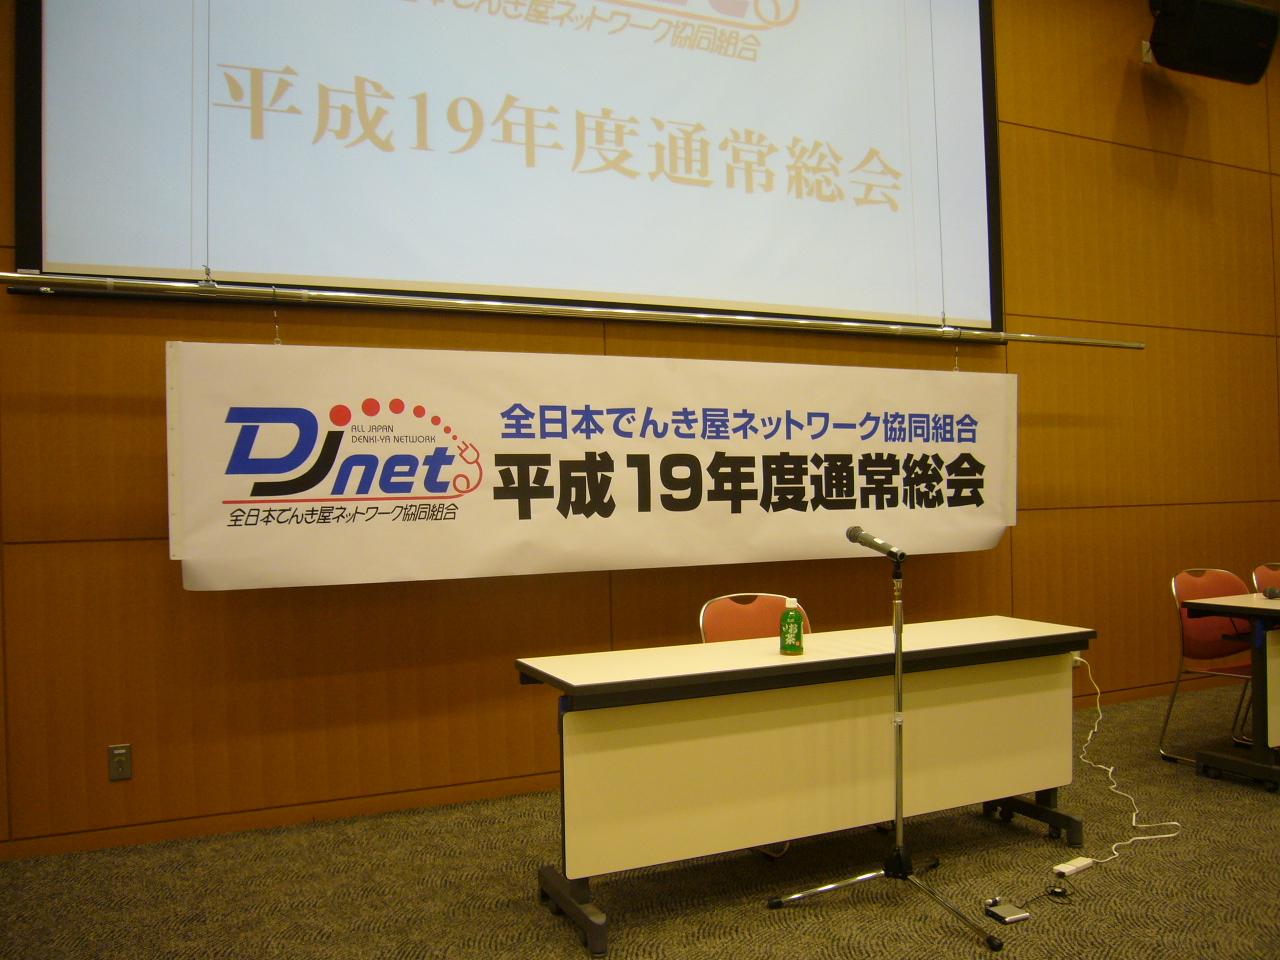 DJ-NET総会に行ってきました